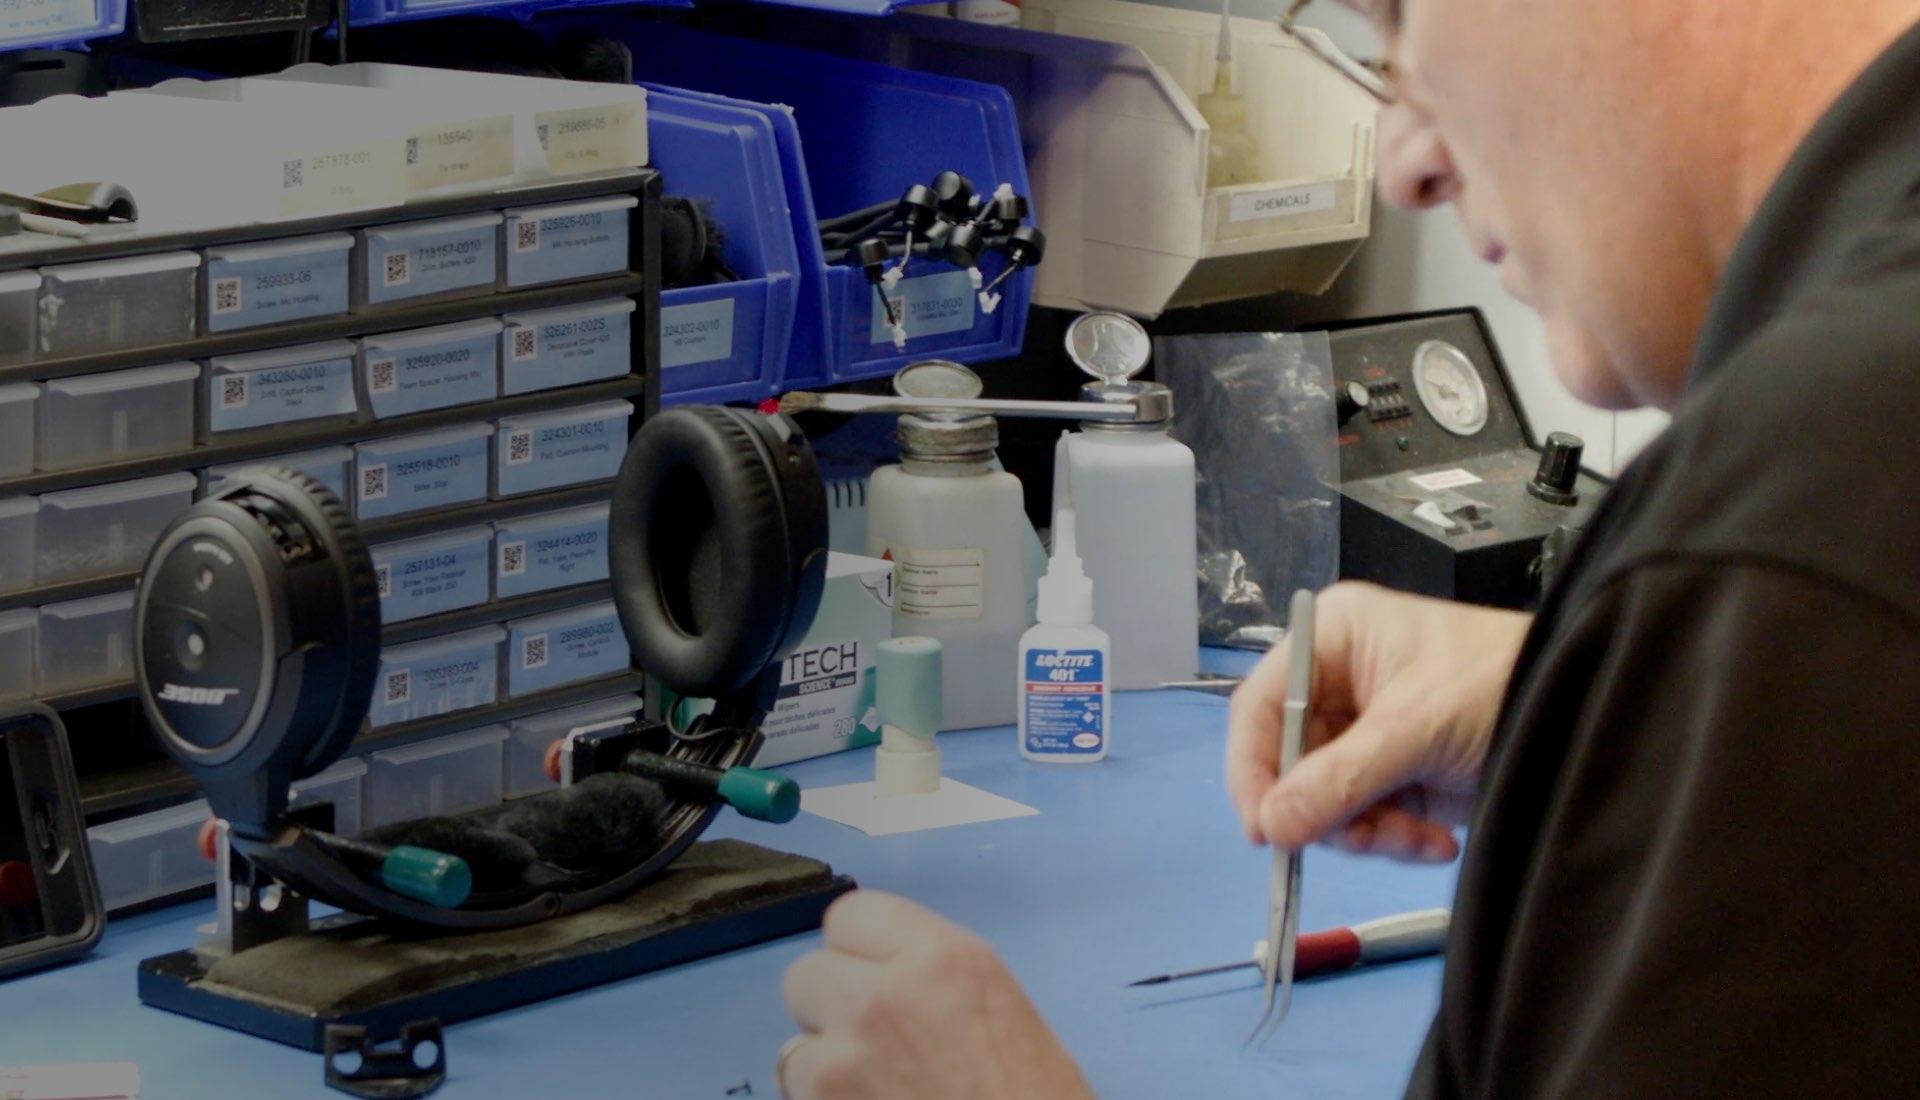 Bose Headset Repair Services